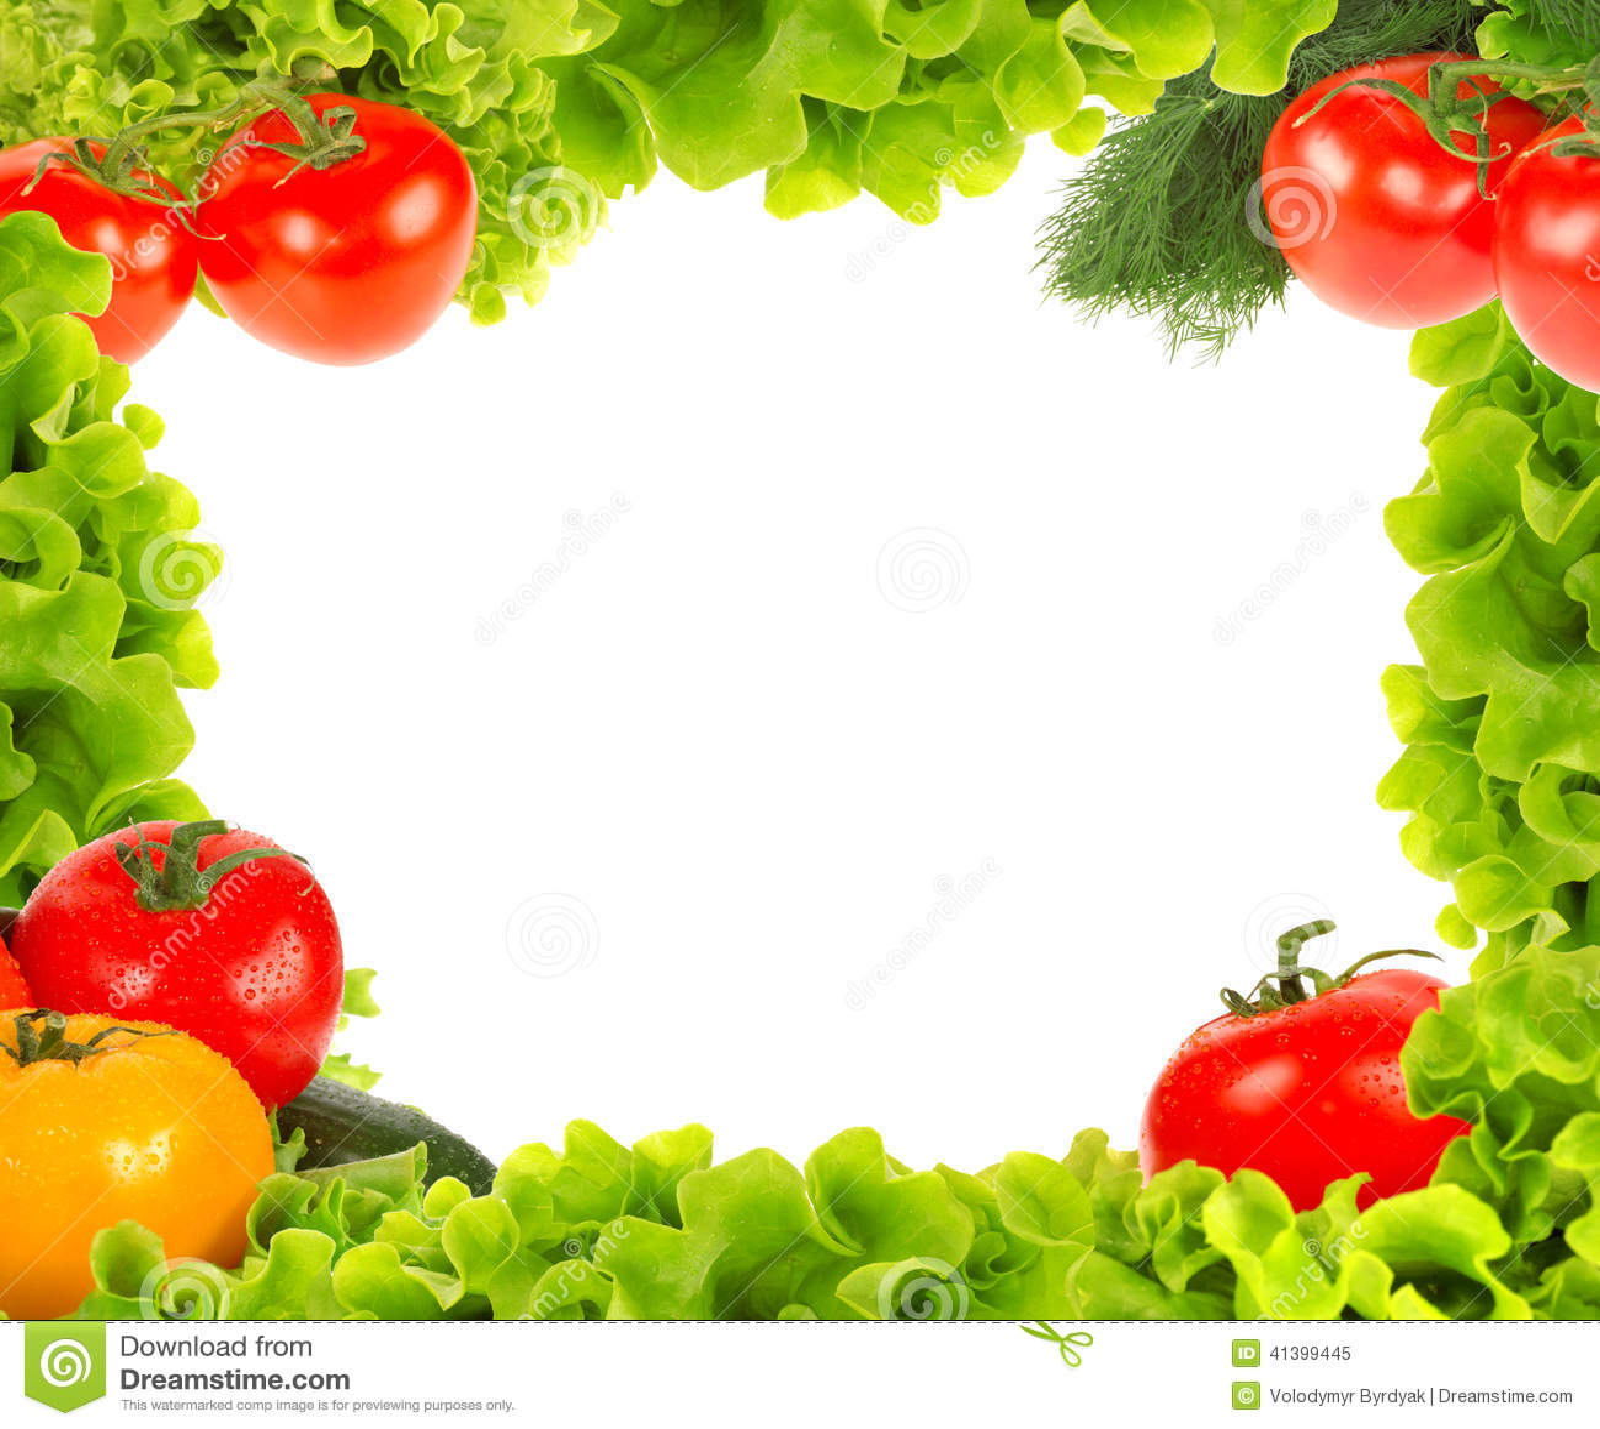 Garden Stock Image Image Of Design: Vegetables Frame Stock Image. Image Of Health, Garden